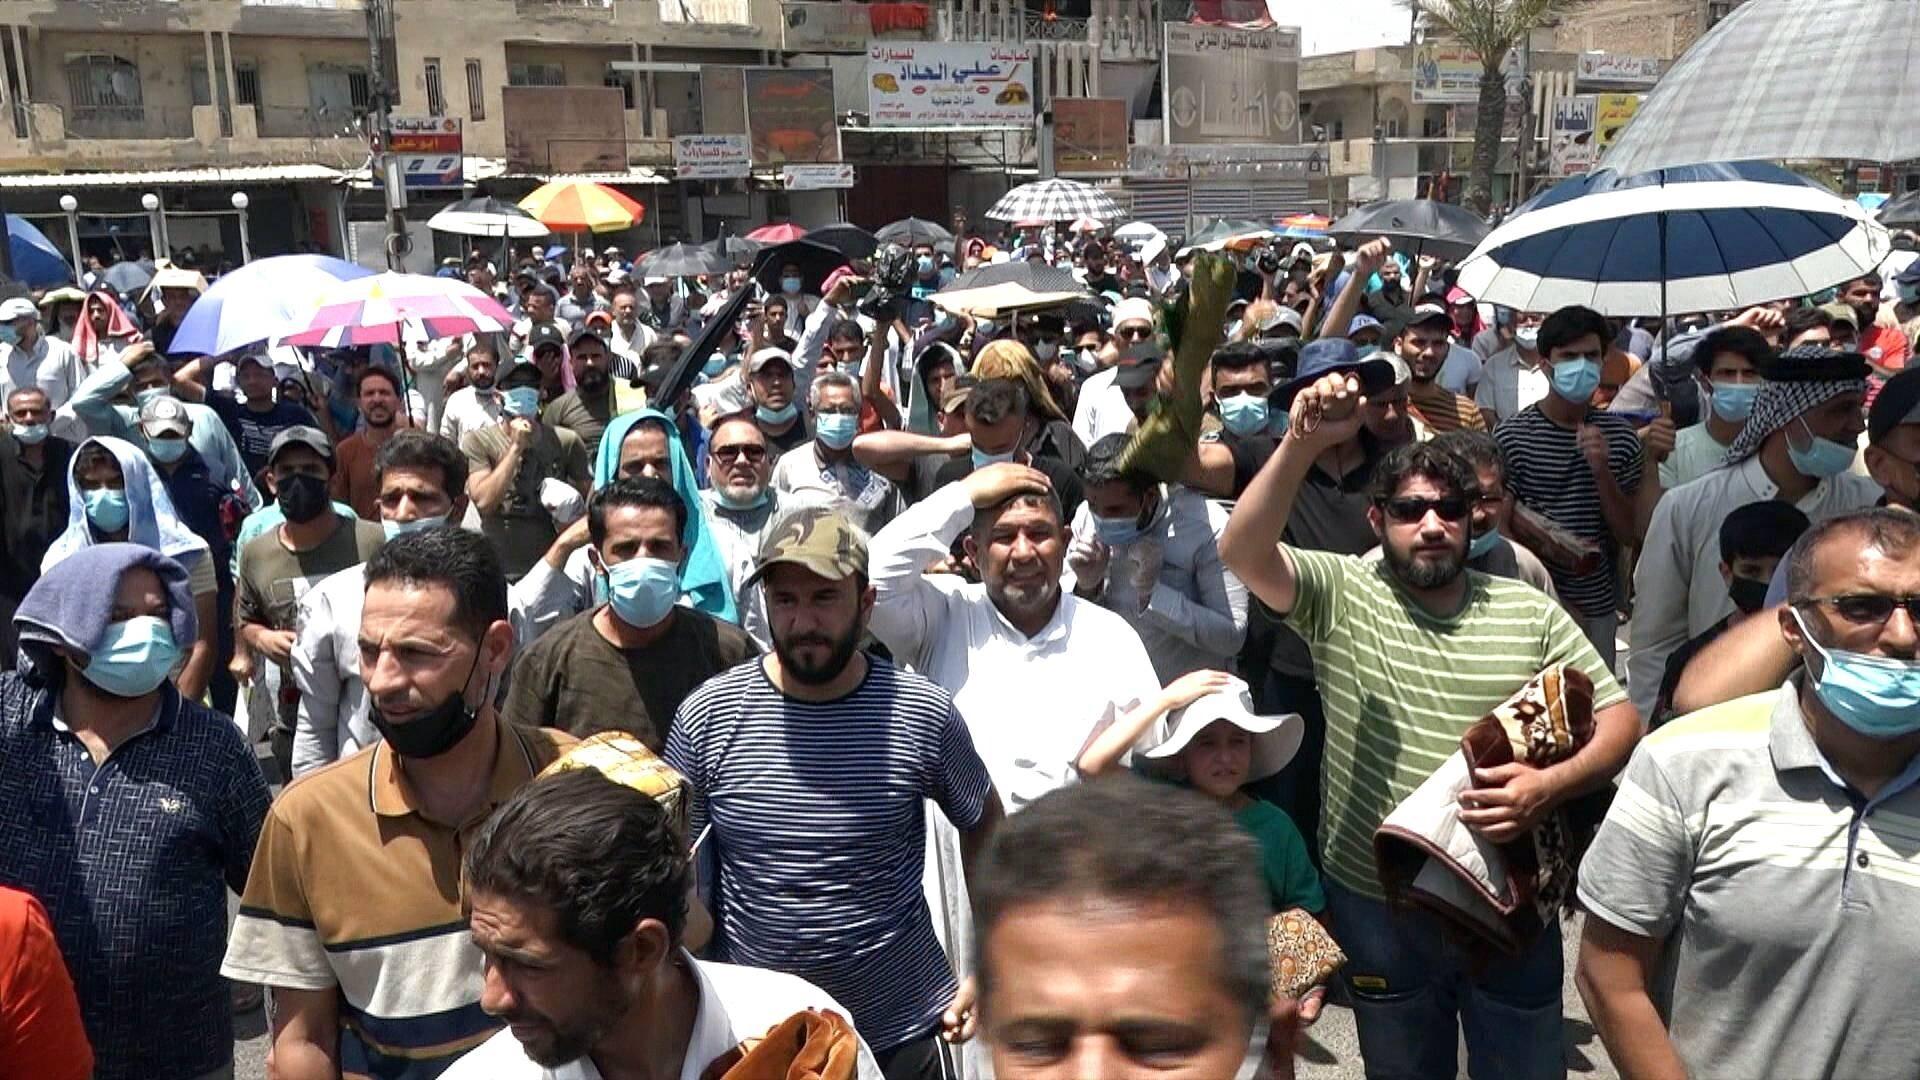 Two killed in Iran's water crisis protests - Tathfonewsarena